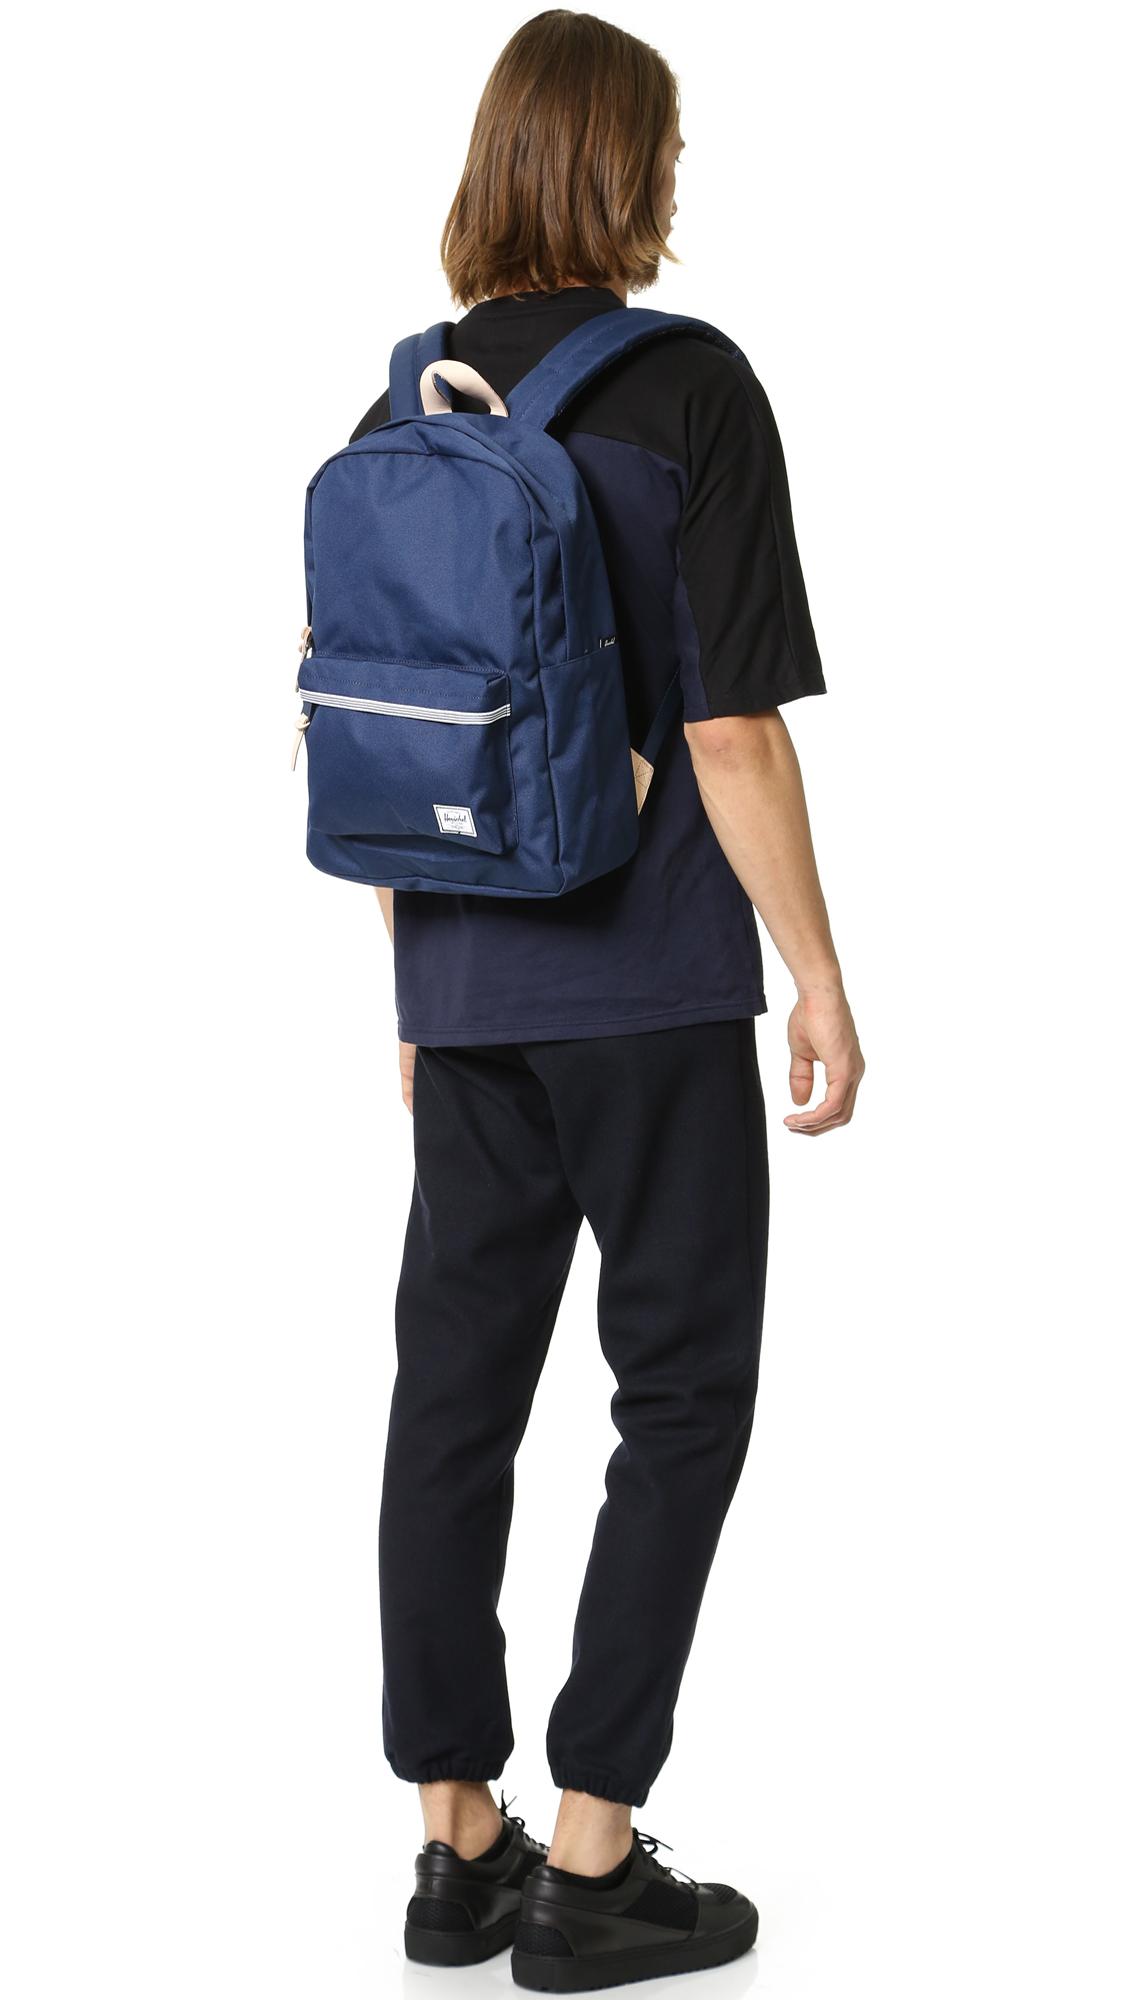 8a222e8bb42 Herschel Supply Co. Winlaw Backpack | EAST DANE